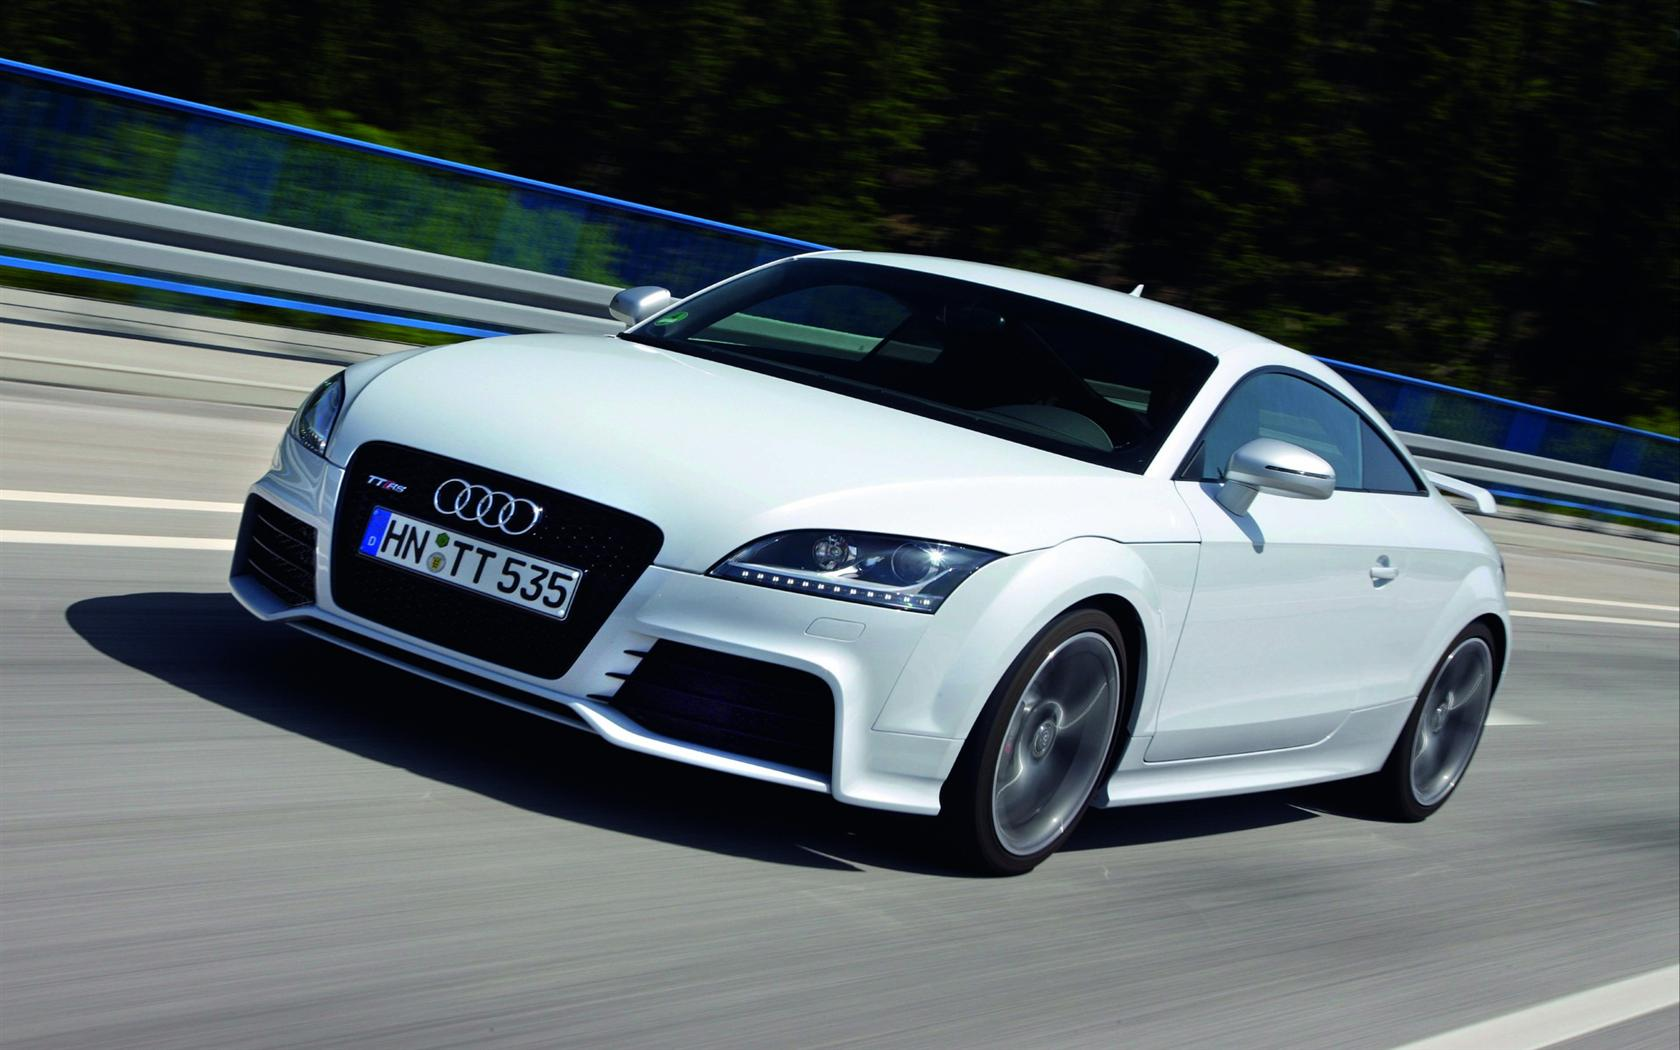 Audi TT RS Wallpapers HD Download 1680x1050